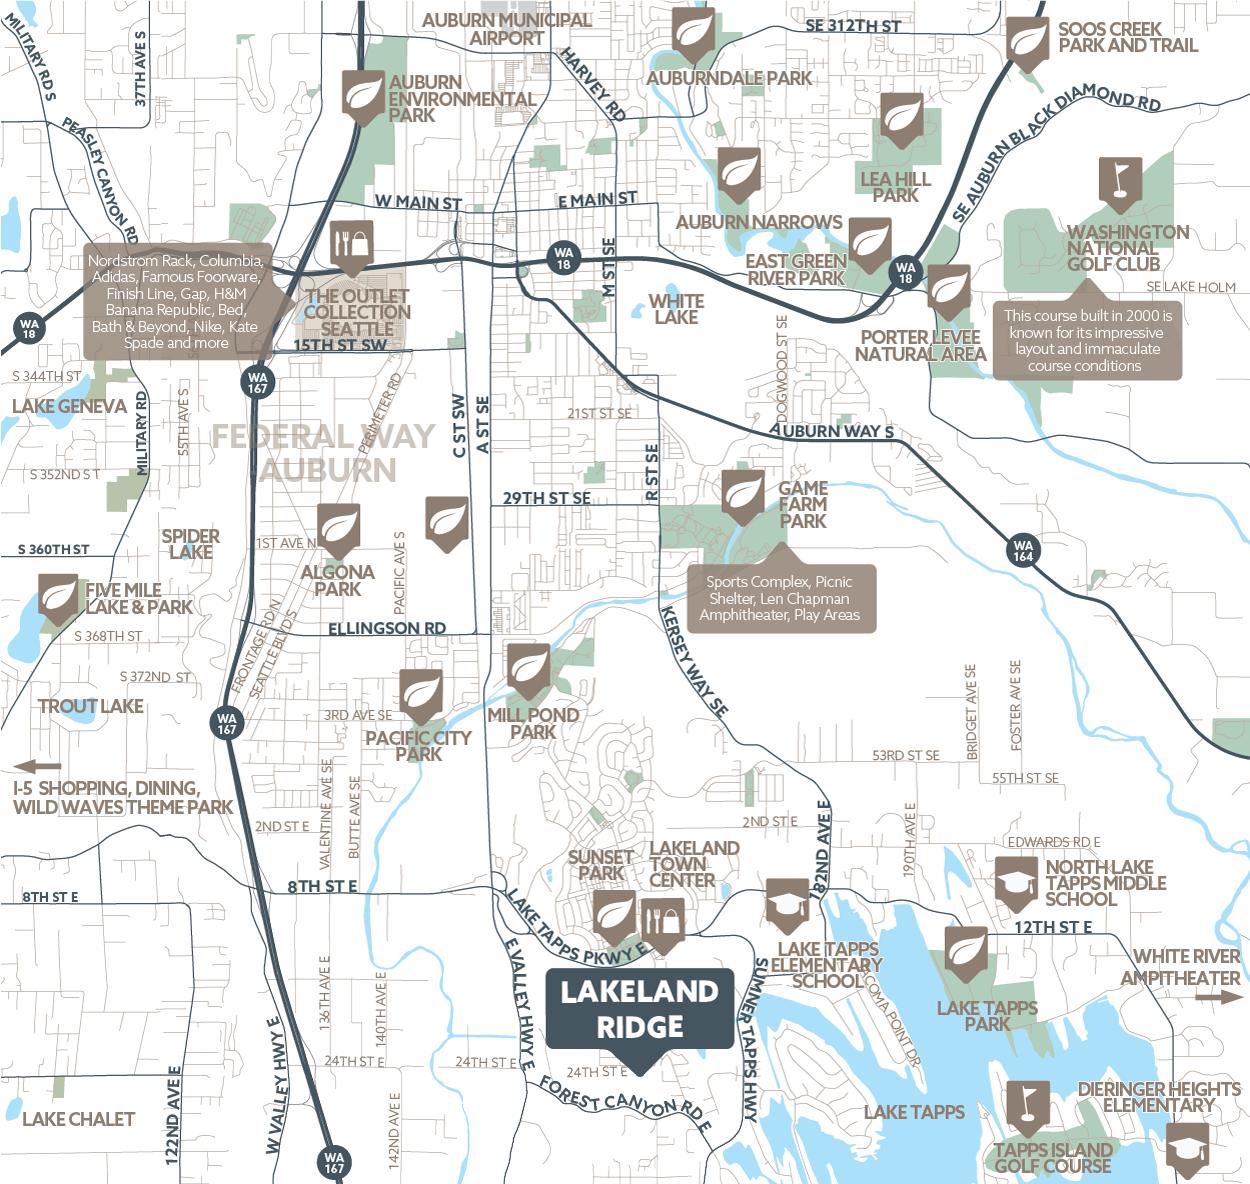 Lakeland Ridge amenity map